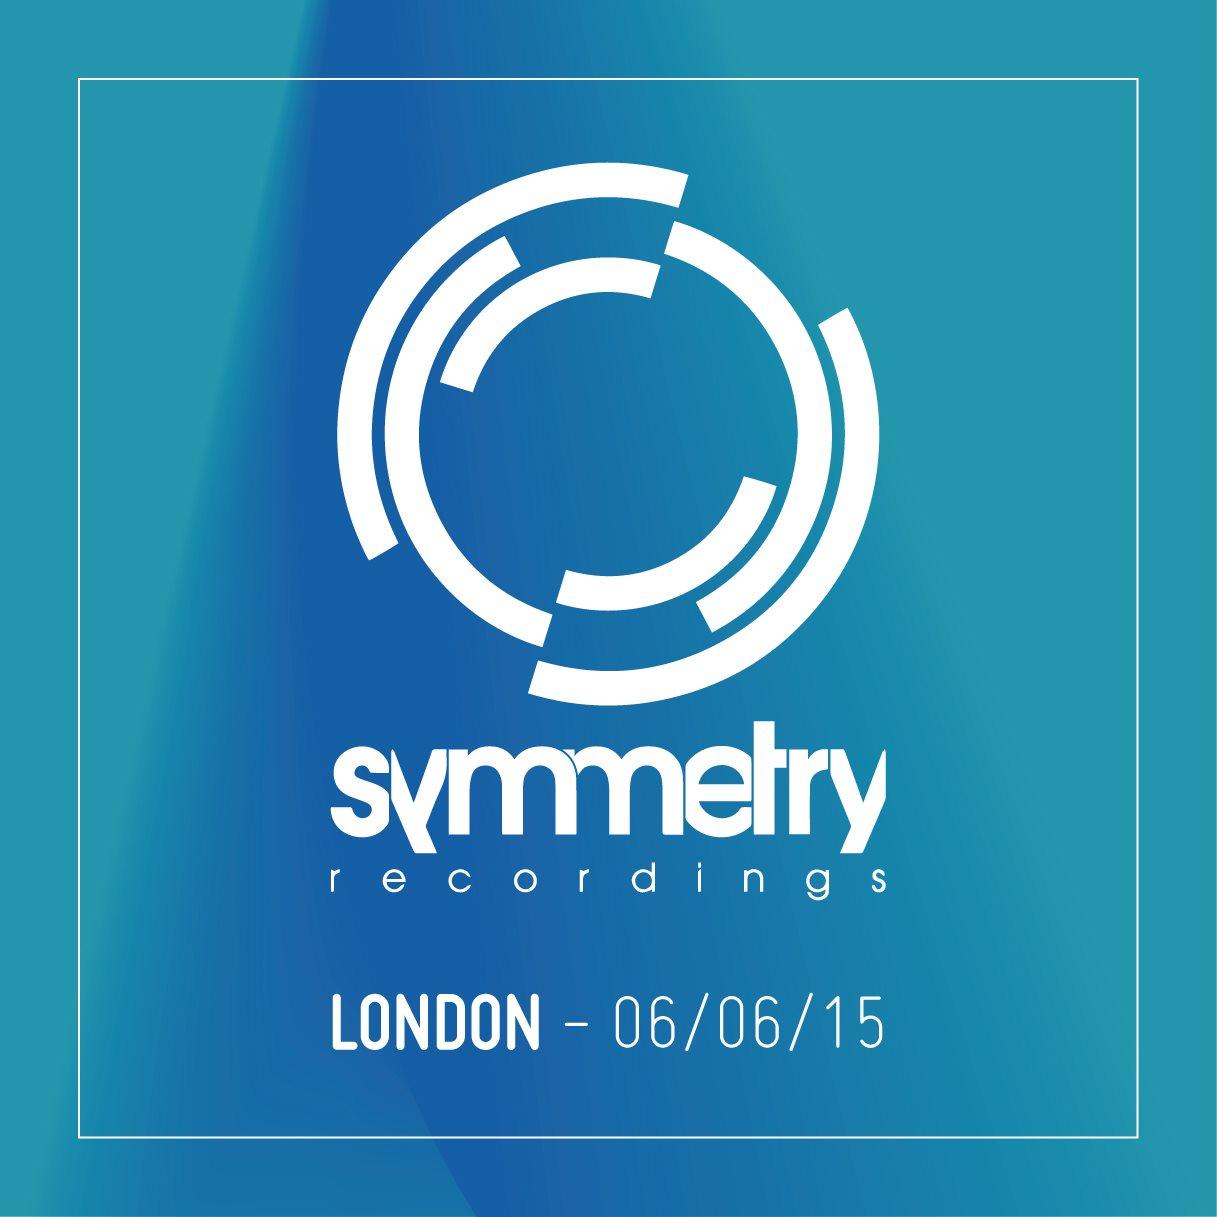 Symmetry Recordings London - Flyer front